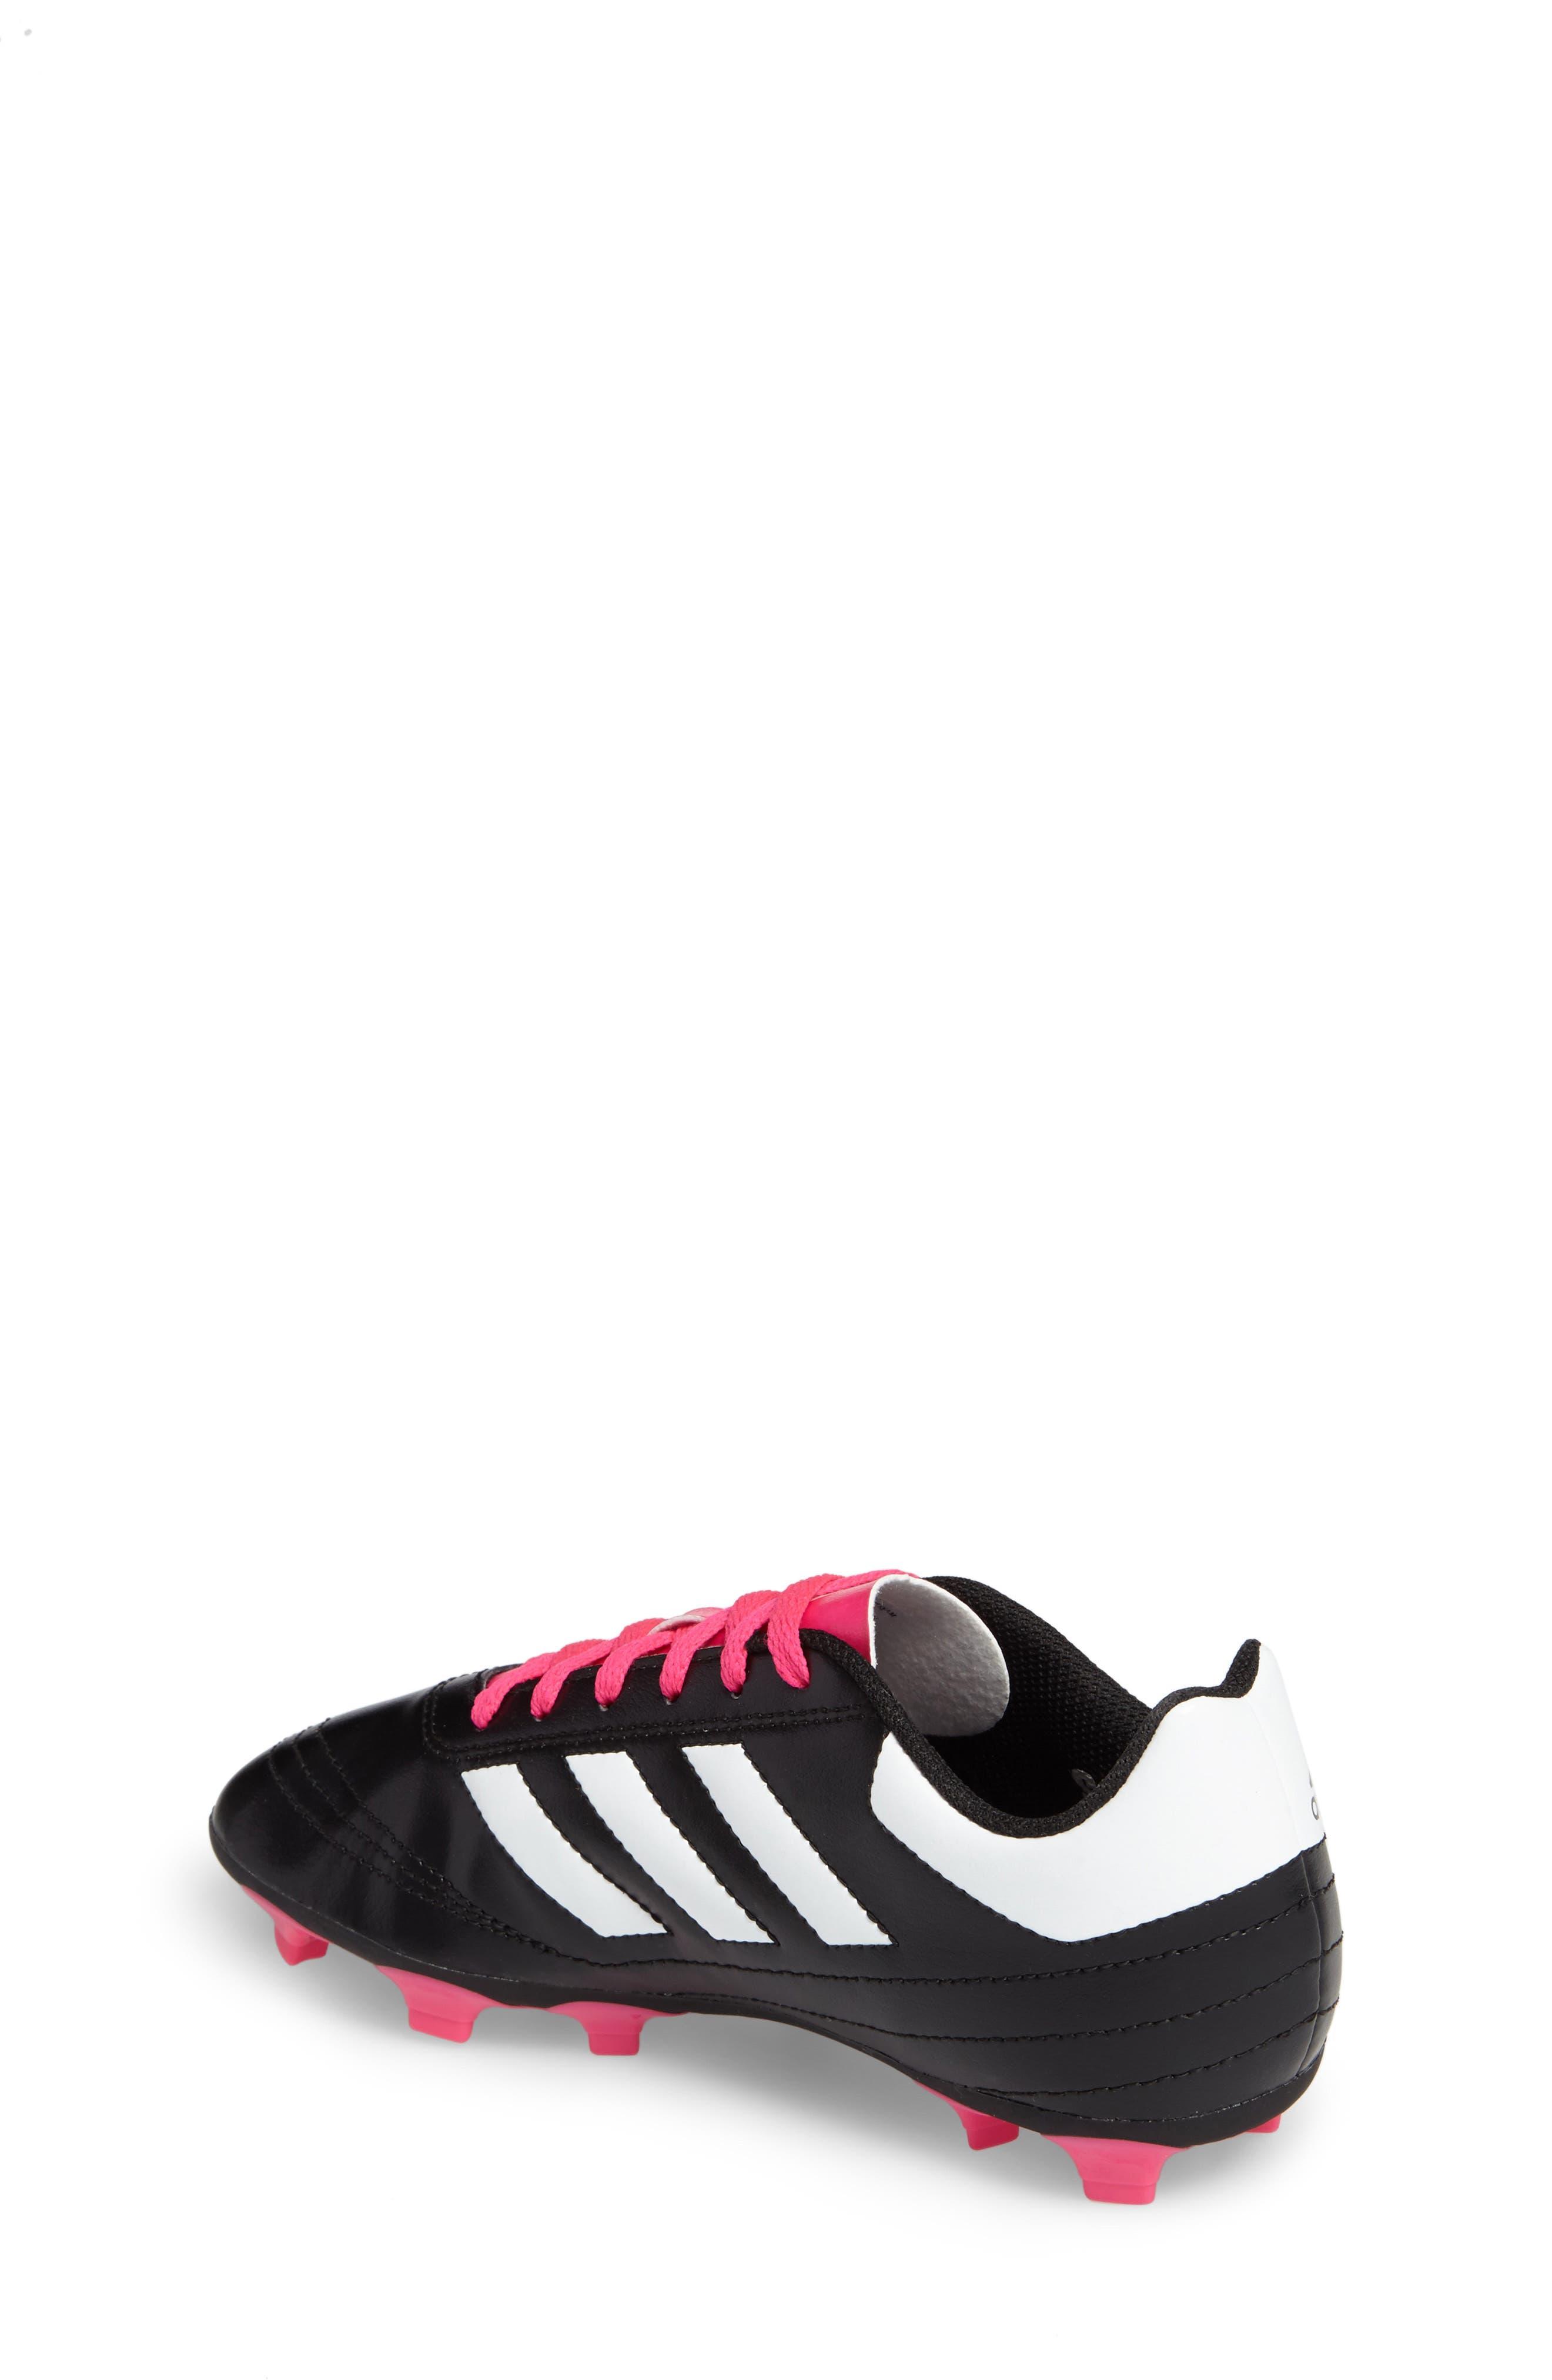 Goletto VI Soccer Shoe,                             Alternate thumbnail 2, color,                             CORE BLACK/ WHITE/ SHOCK PINK